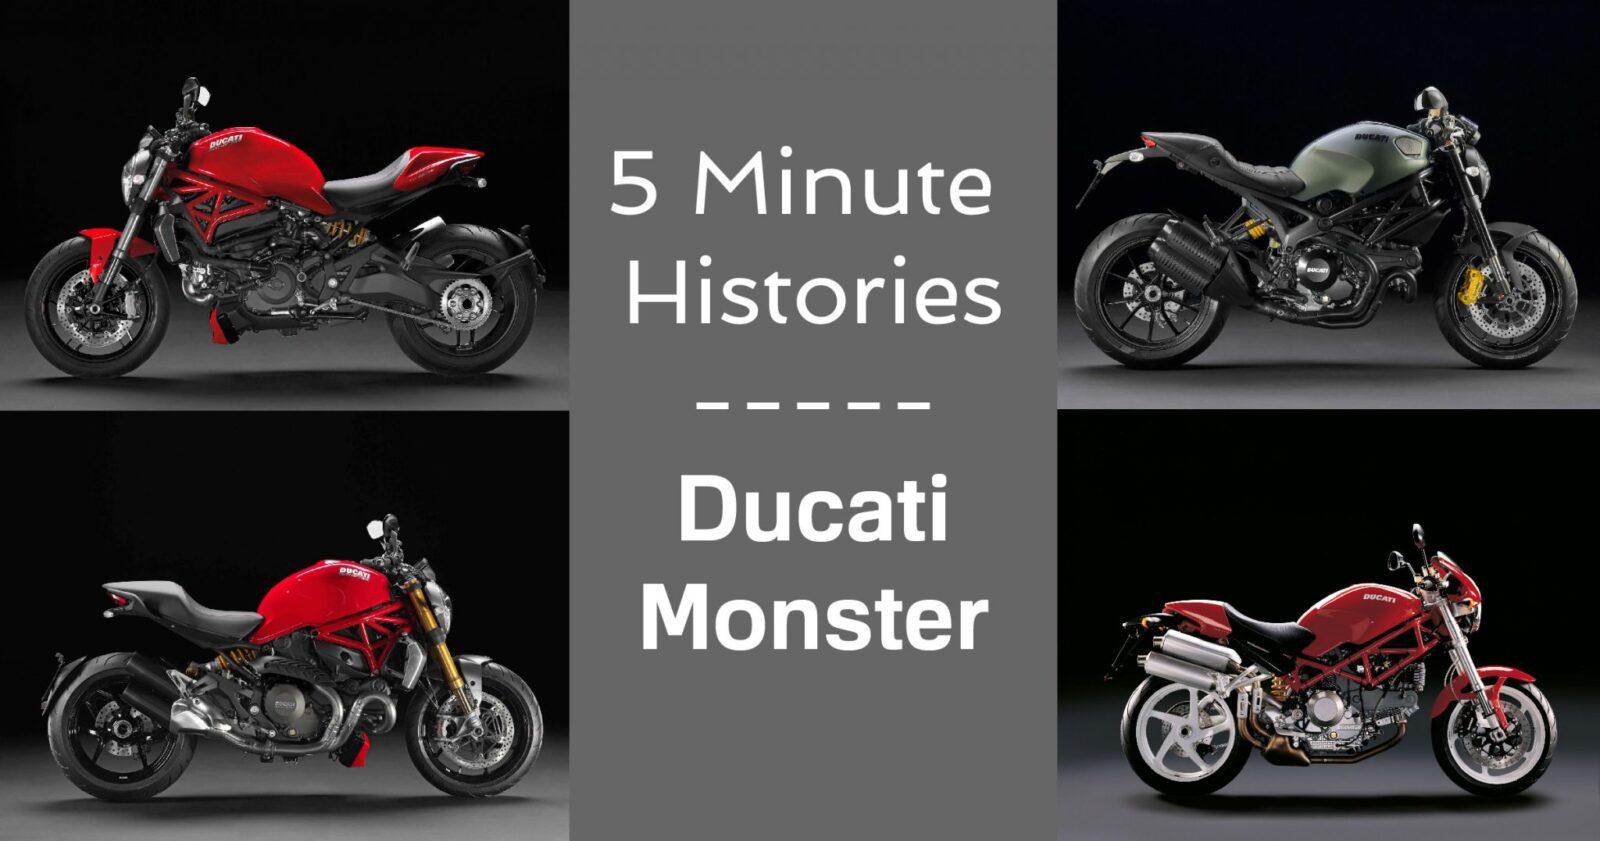 5 Minute Histories: Ducati Monster